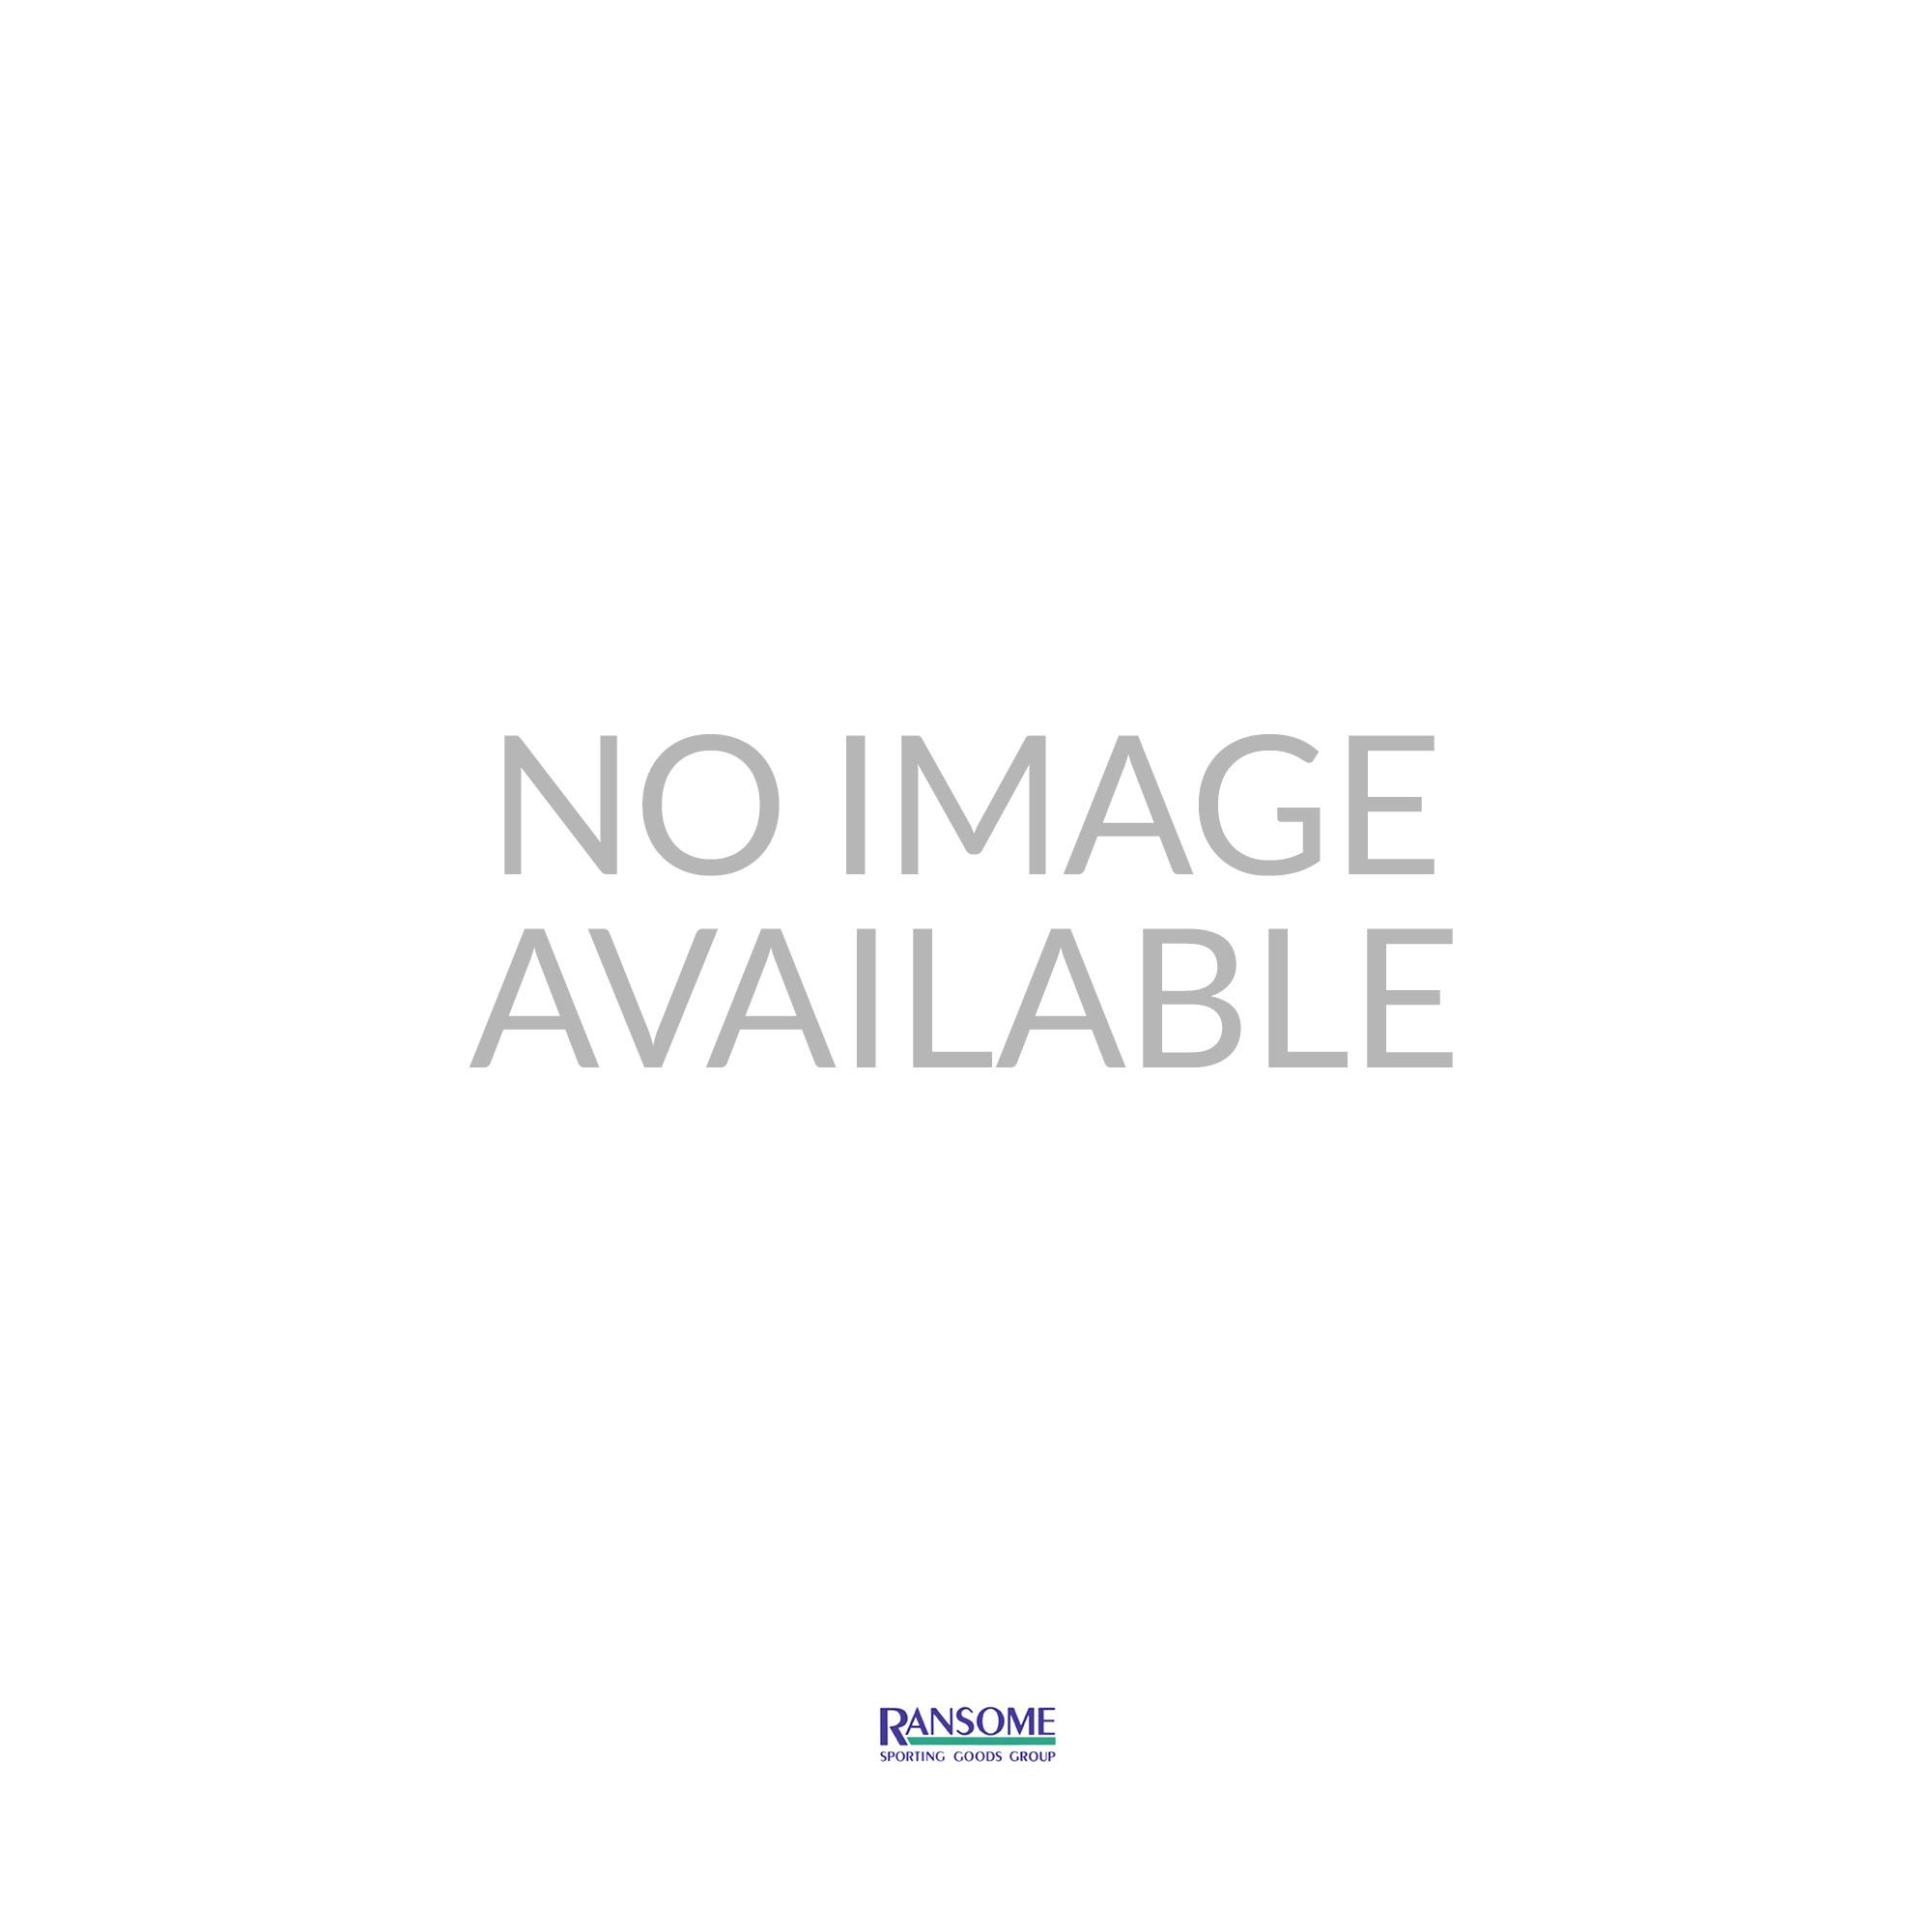 SX300 Tan Rubber Basketballs